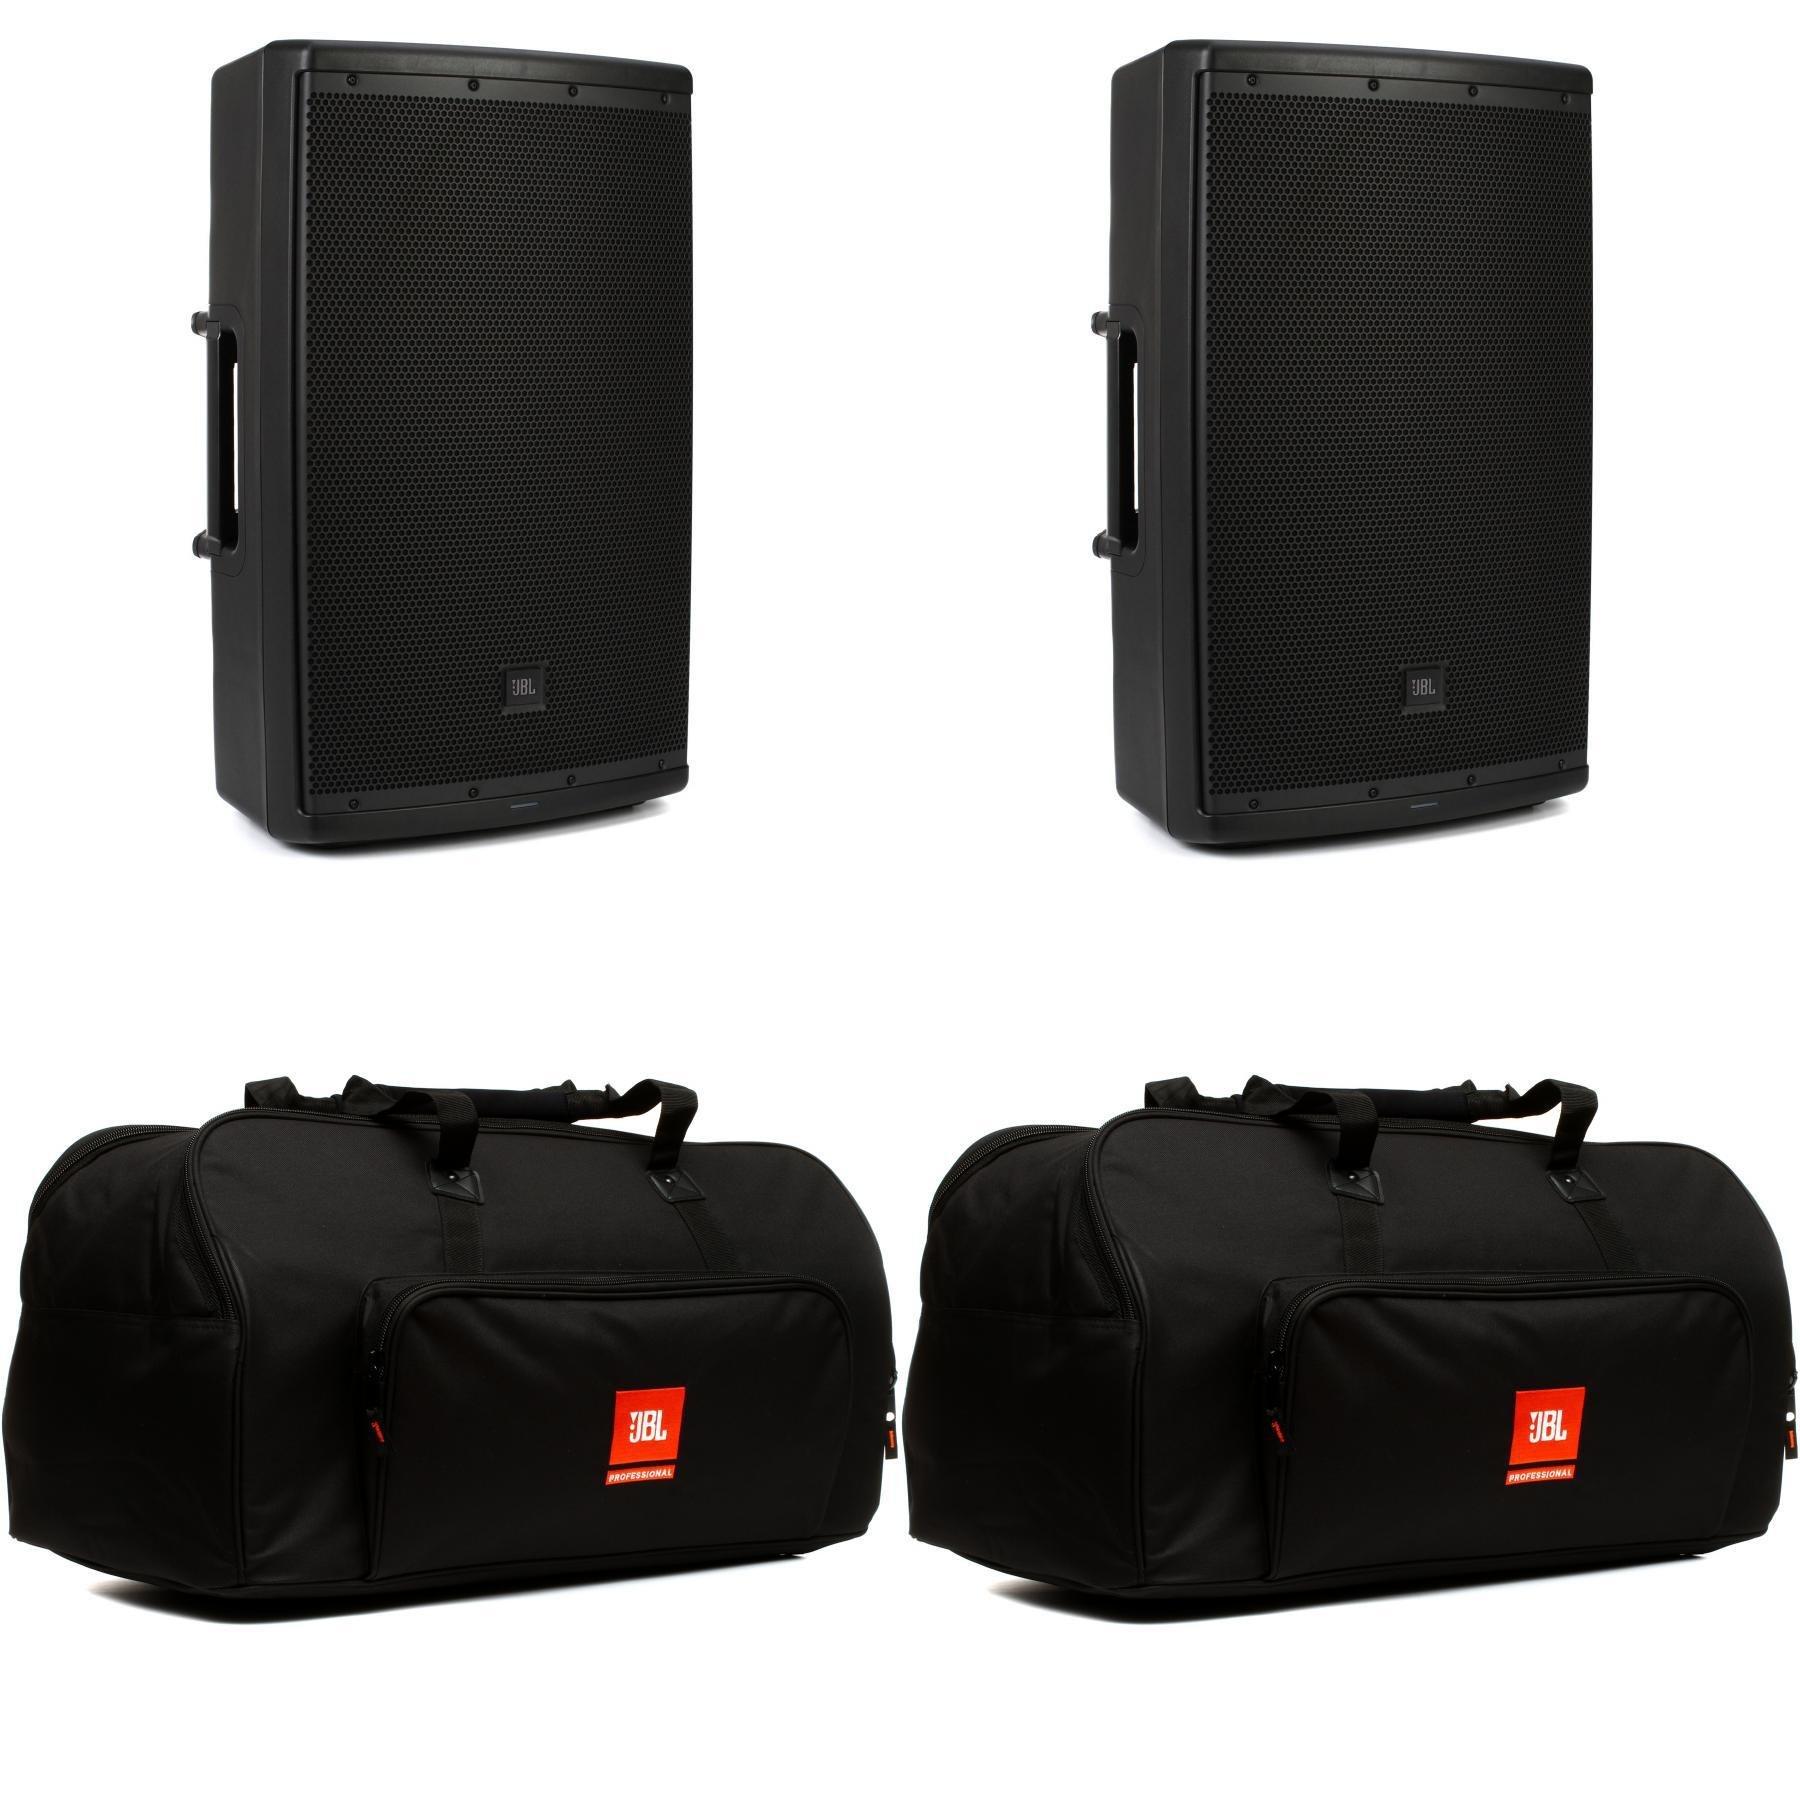 JBL EON615 Speaker Pair with Bags image 1 de3ad099b89